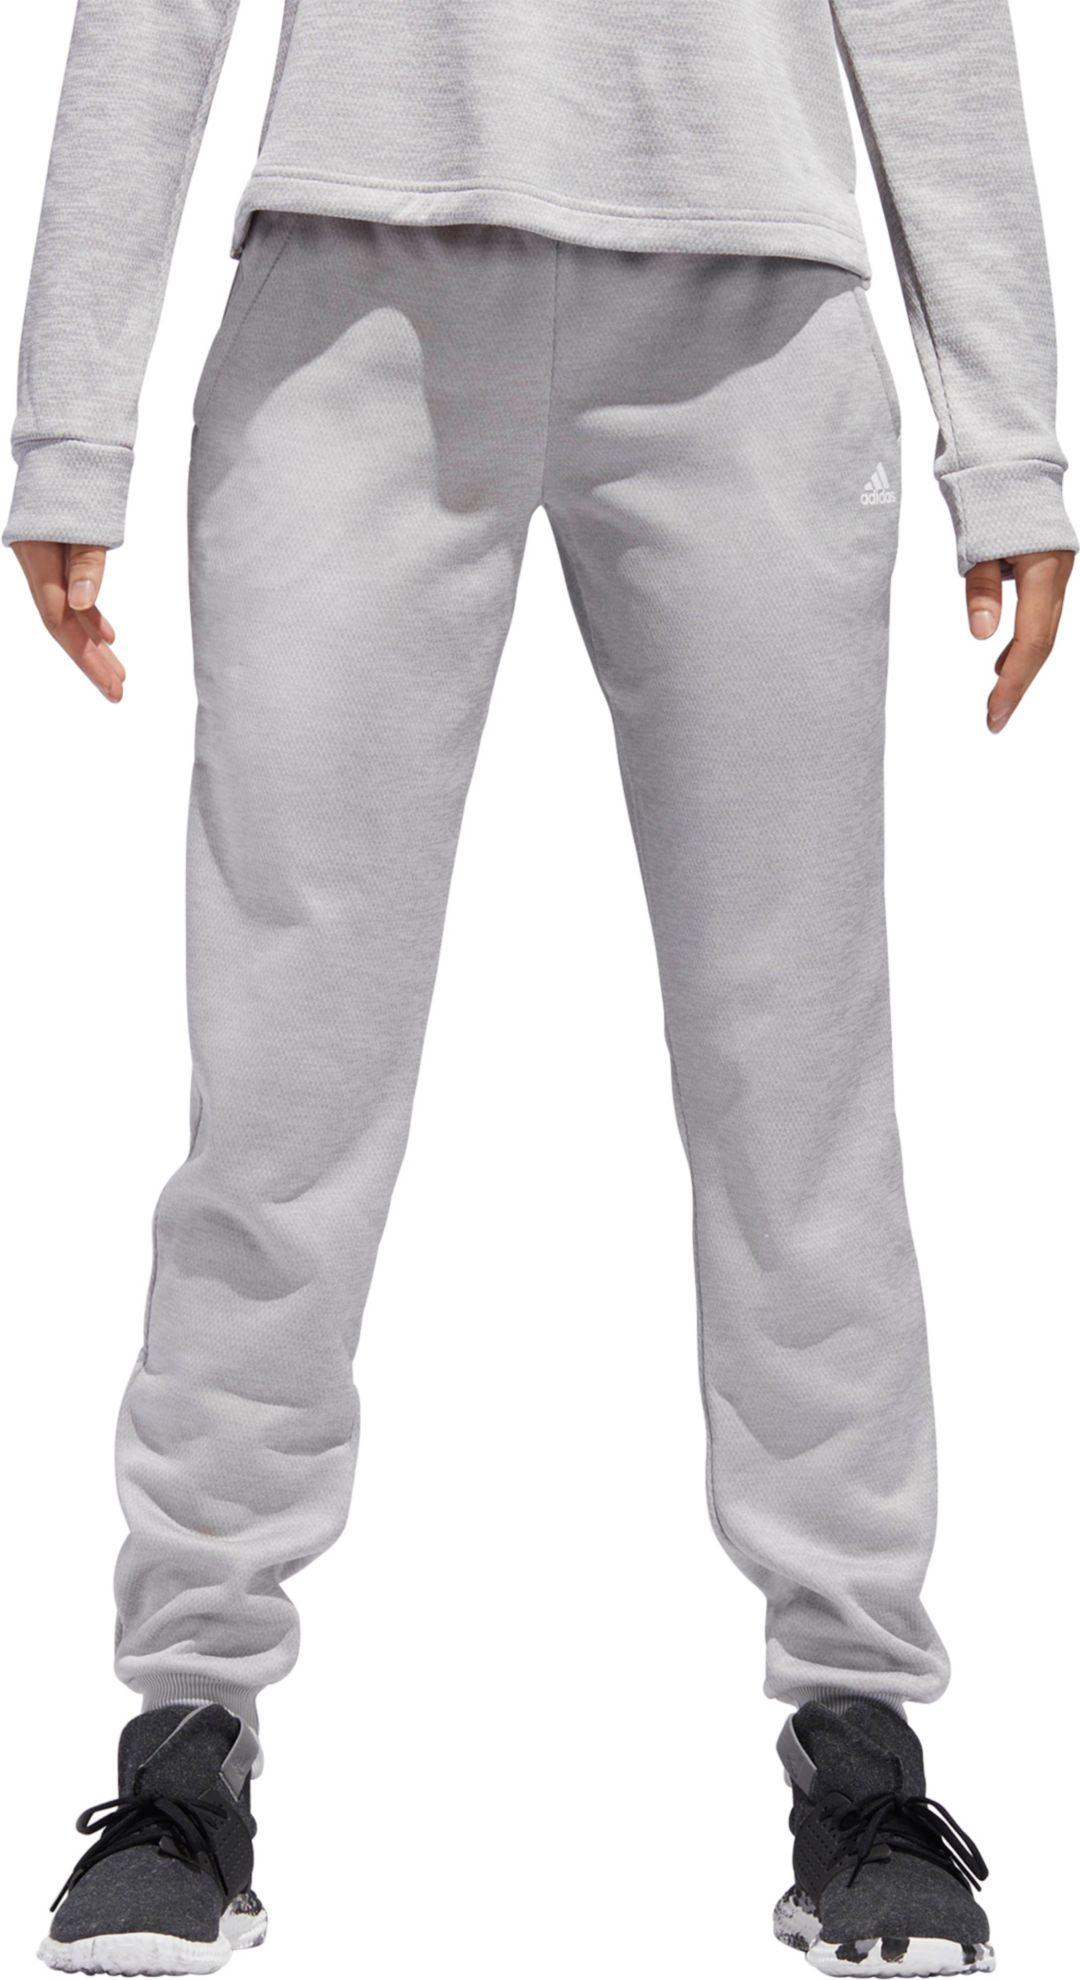 e4151071db adidas Women's Team Issue Jogger Pants